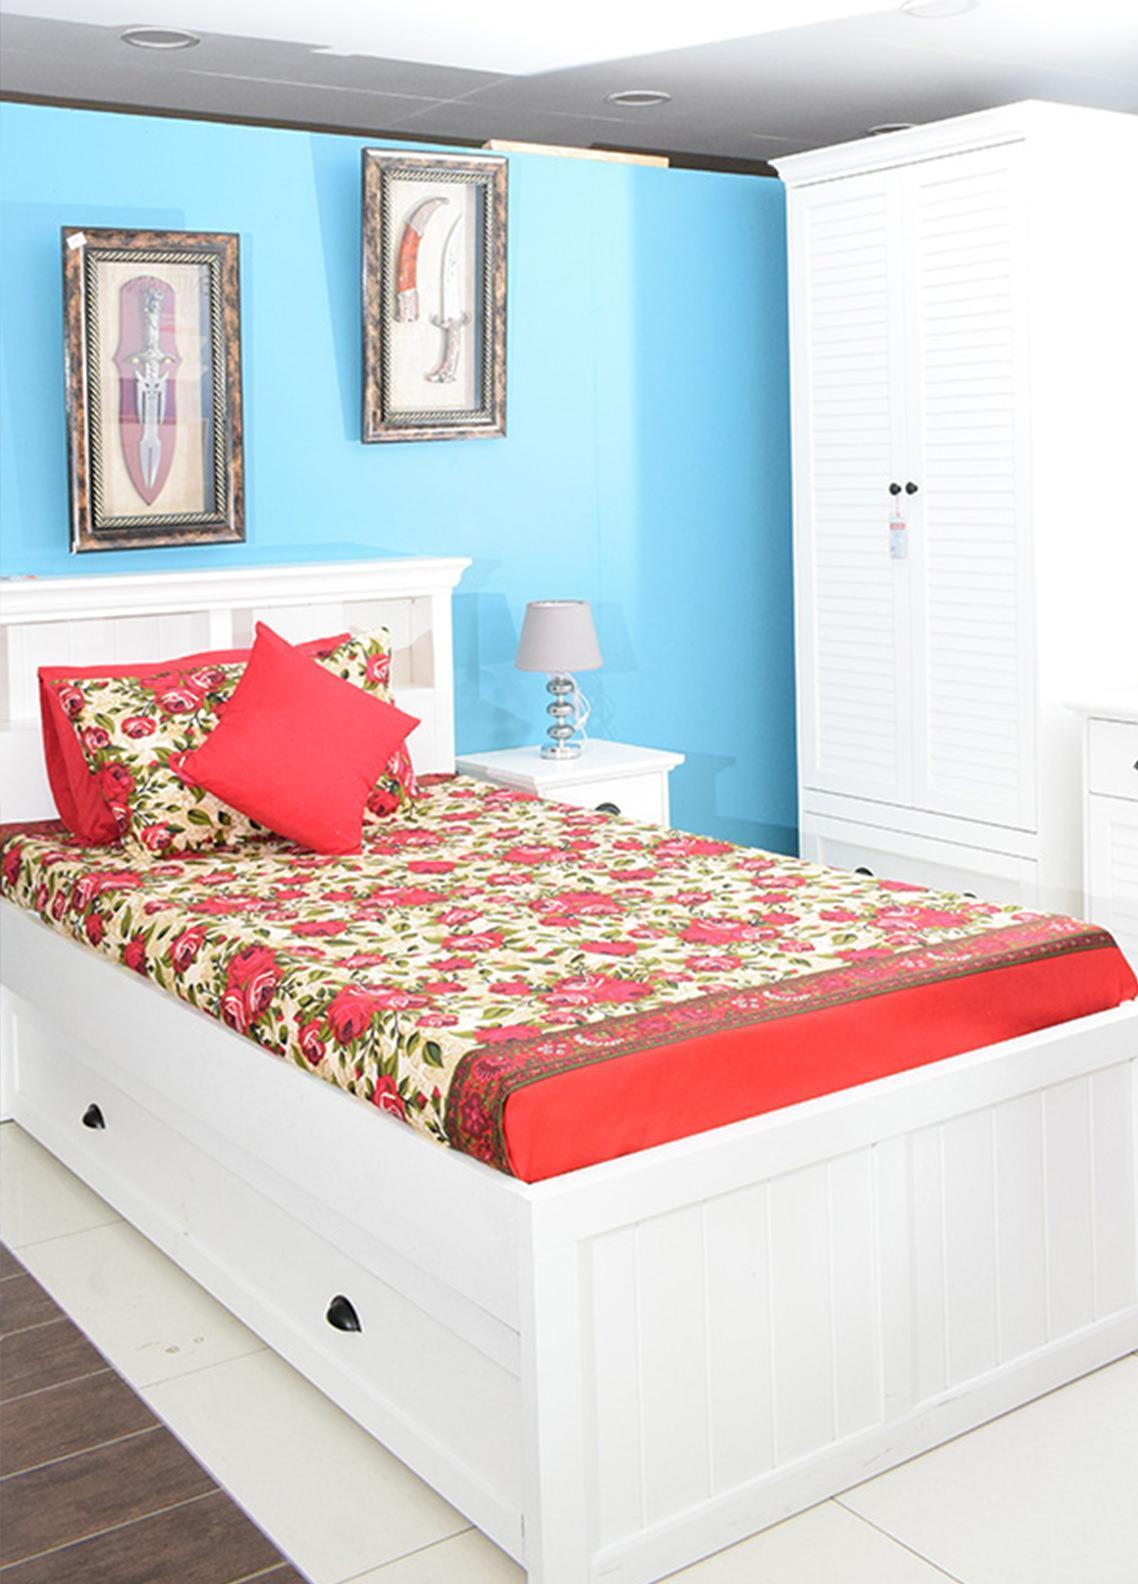 Plush Mink Single Bed Man Made Material Fantasy Bed Sheet Supreme Finish FS01 - Home & Decor